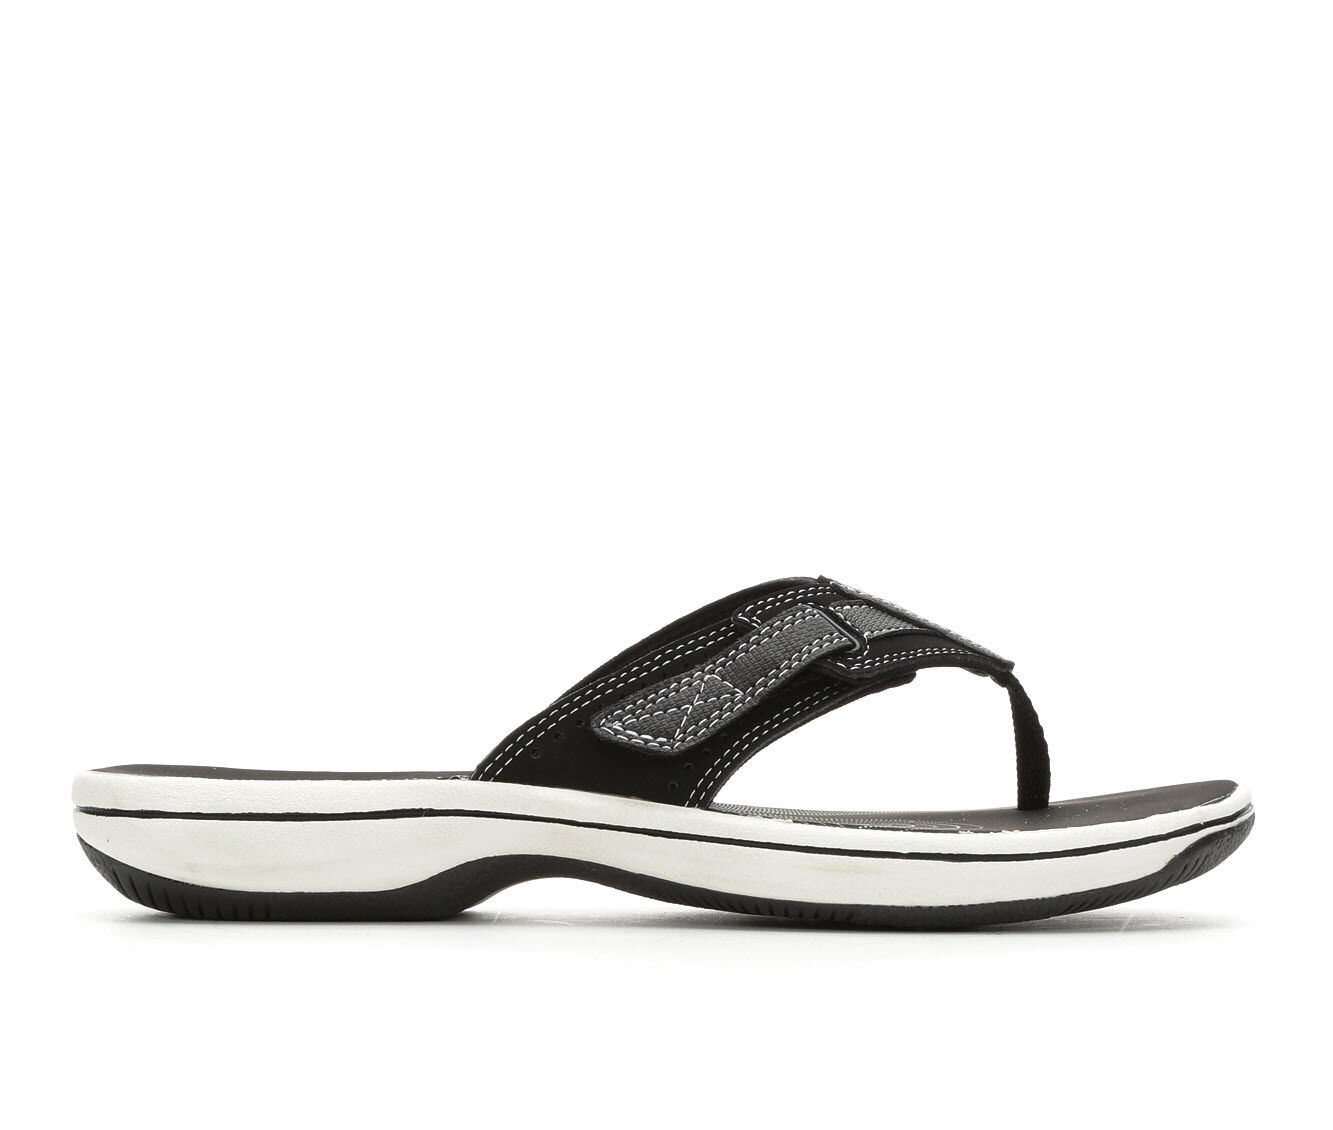 uk shoes_kd6873